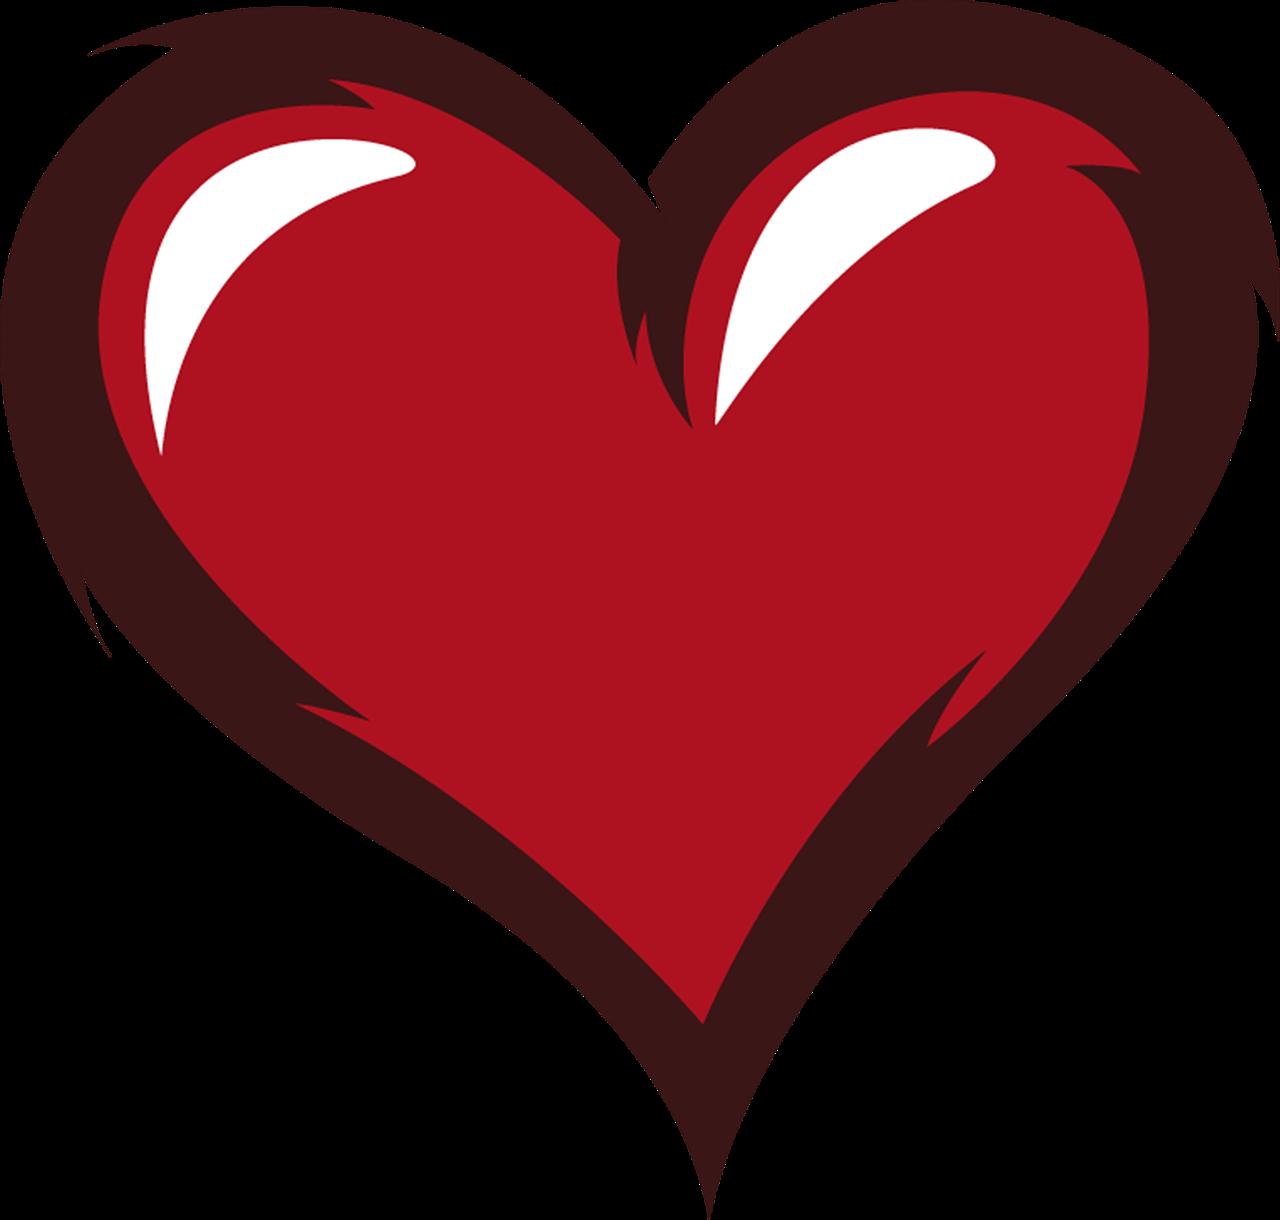 heart 1218002 1280